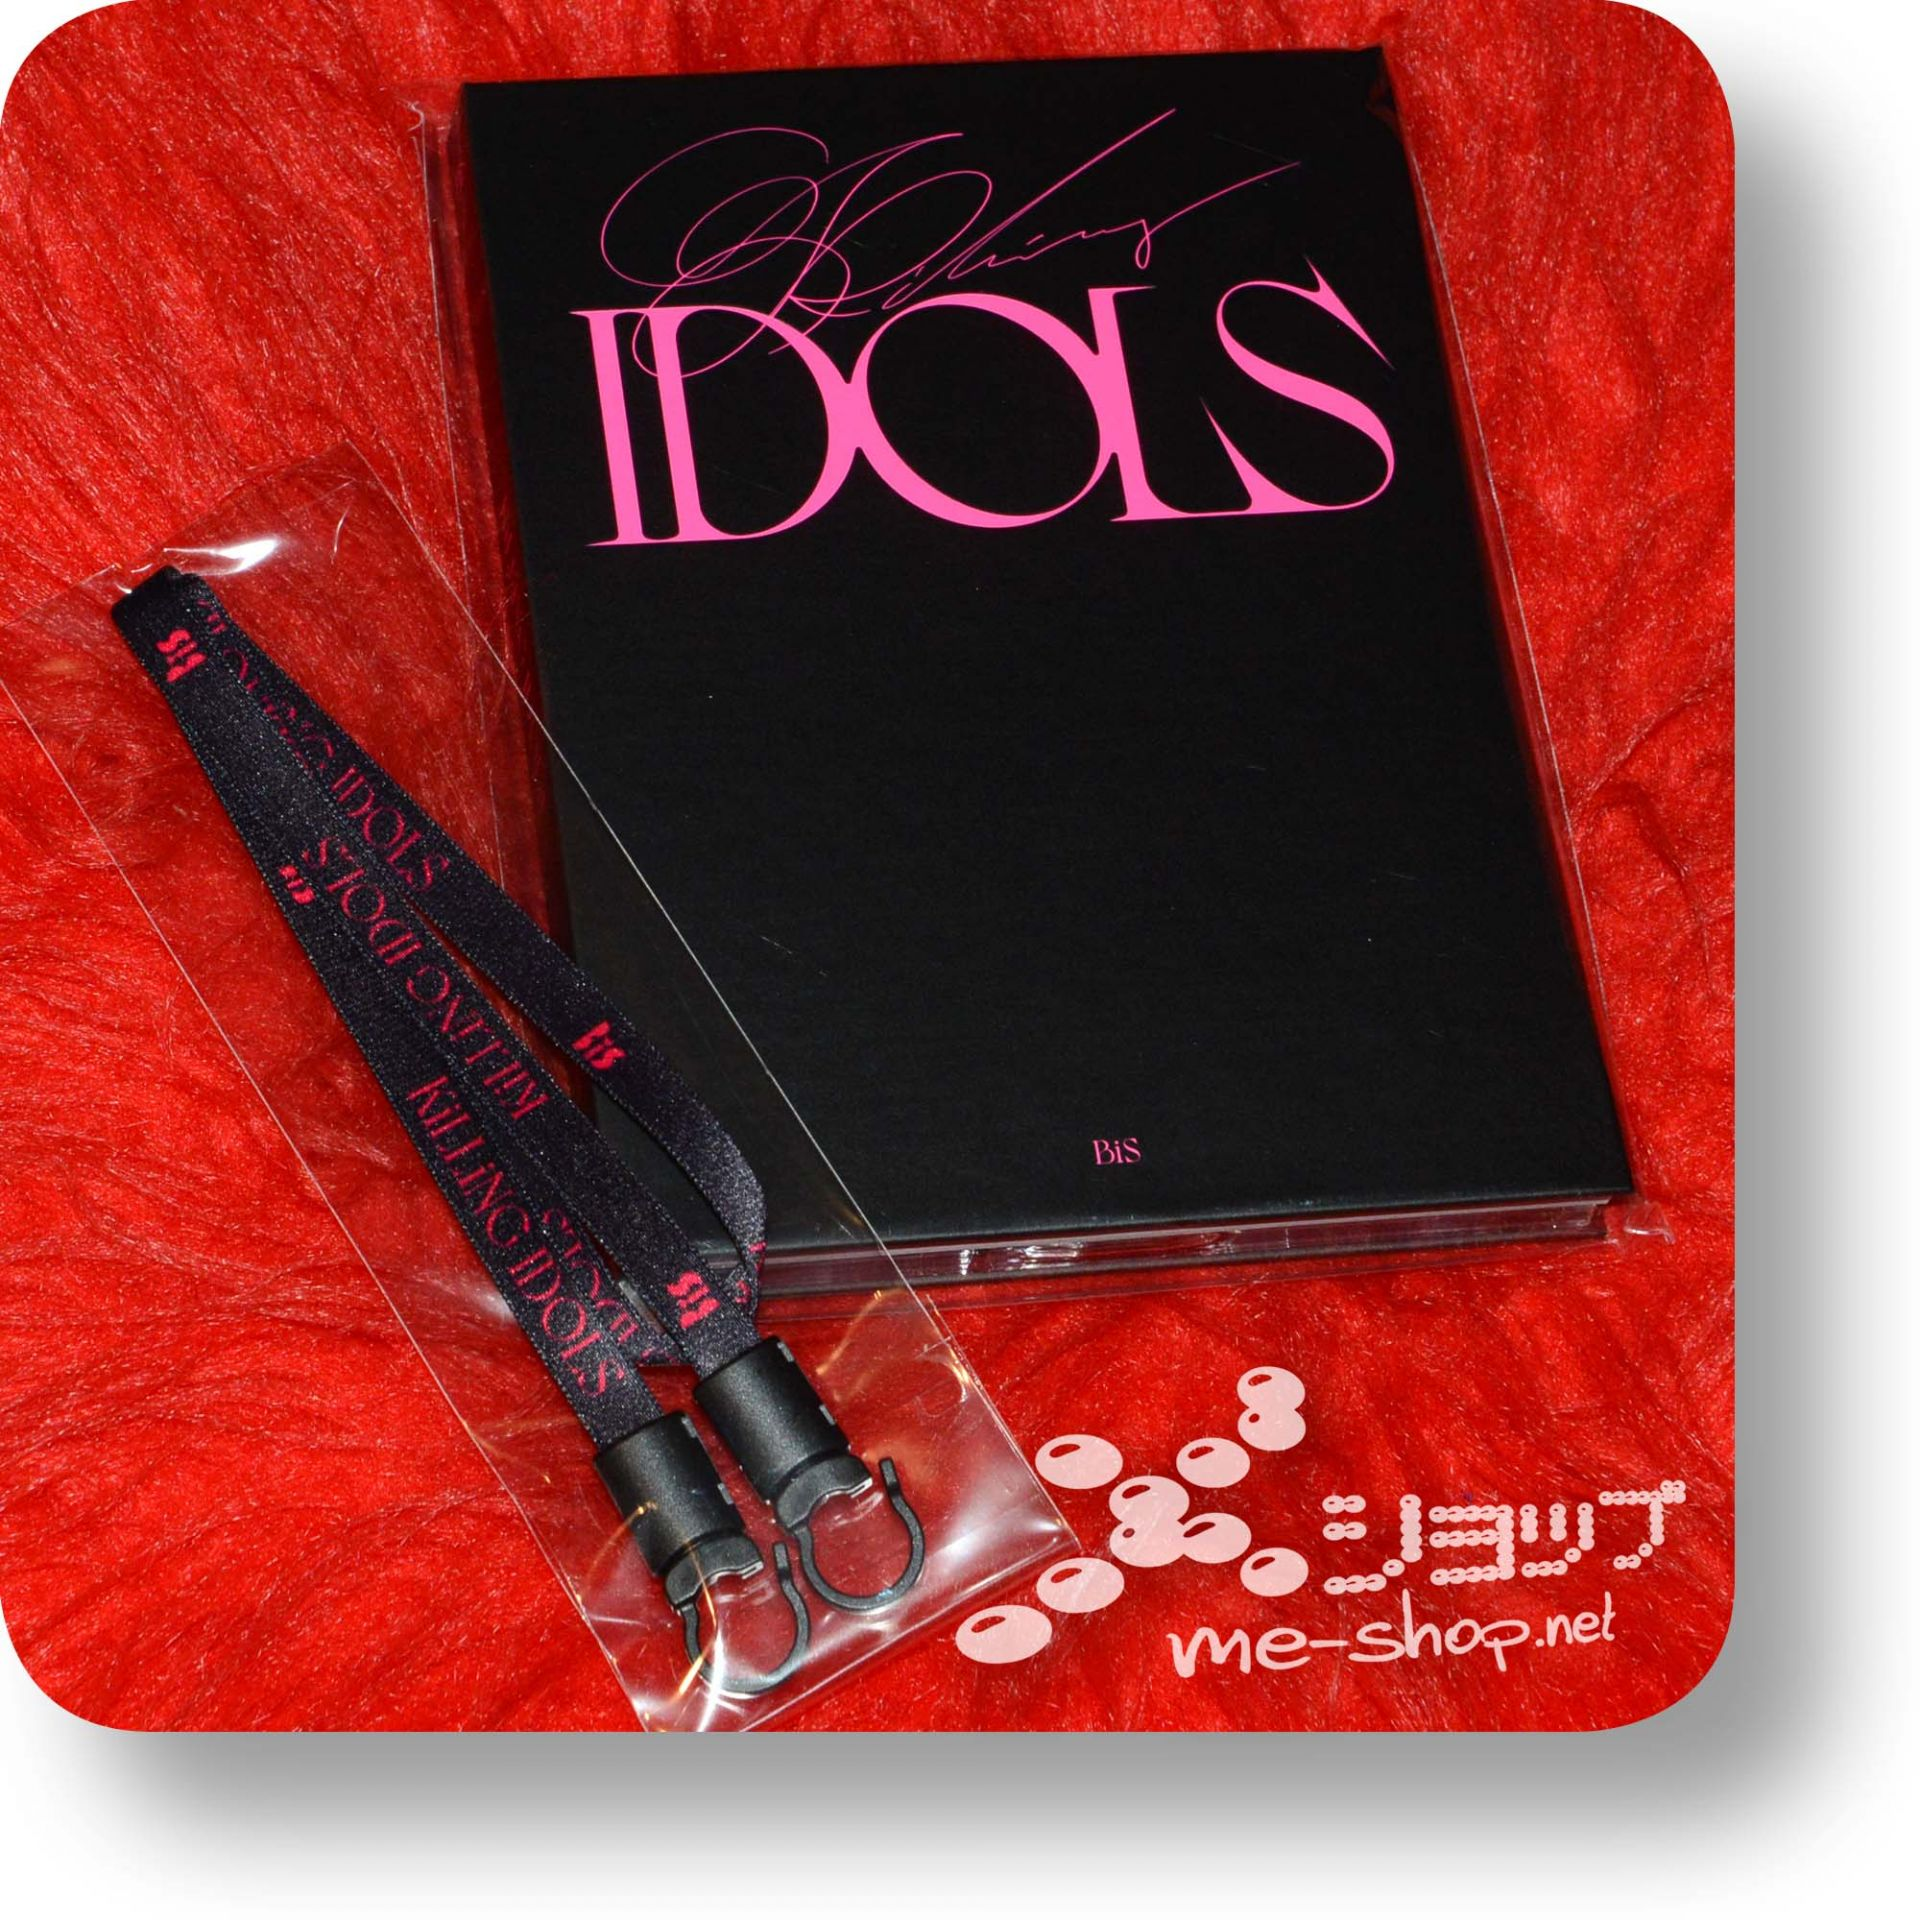 bis killing idols lim+bonus